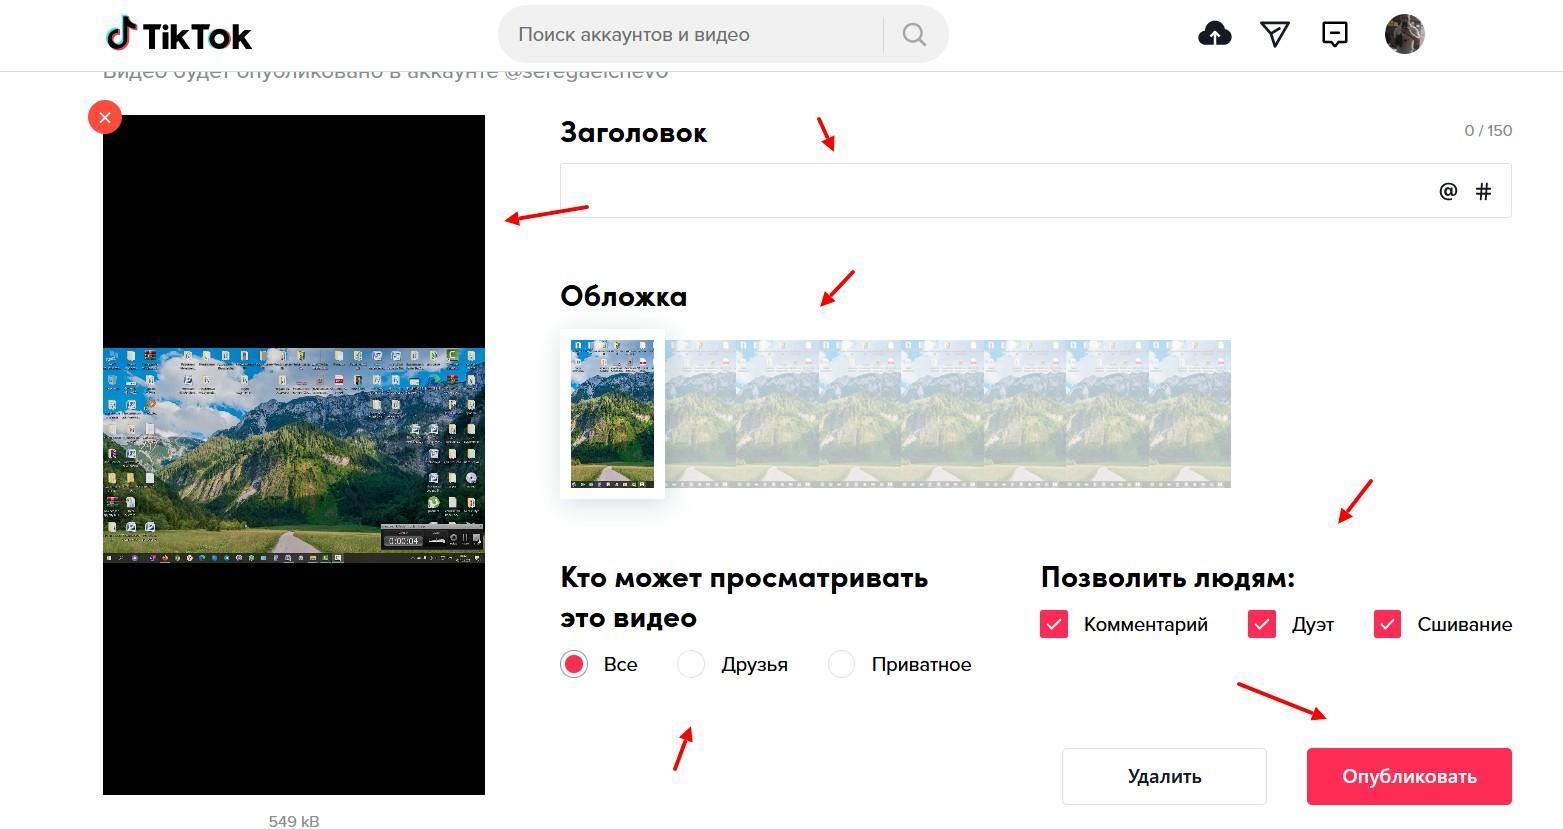 publikatsiya video 2